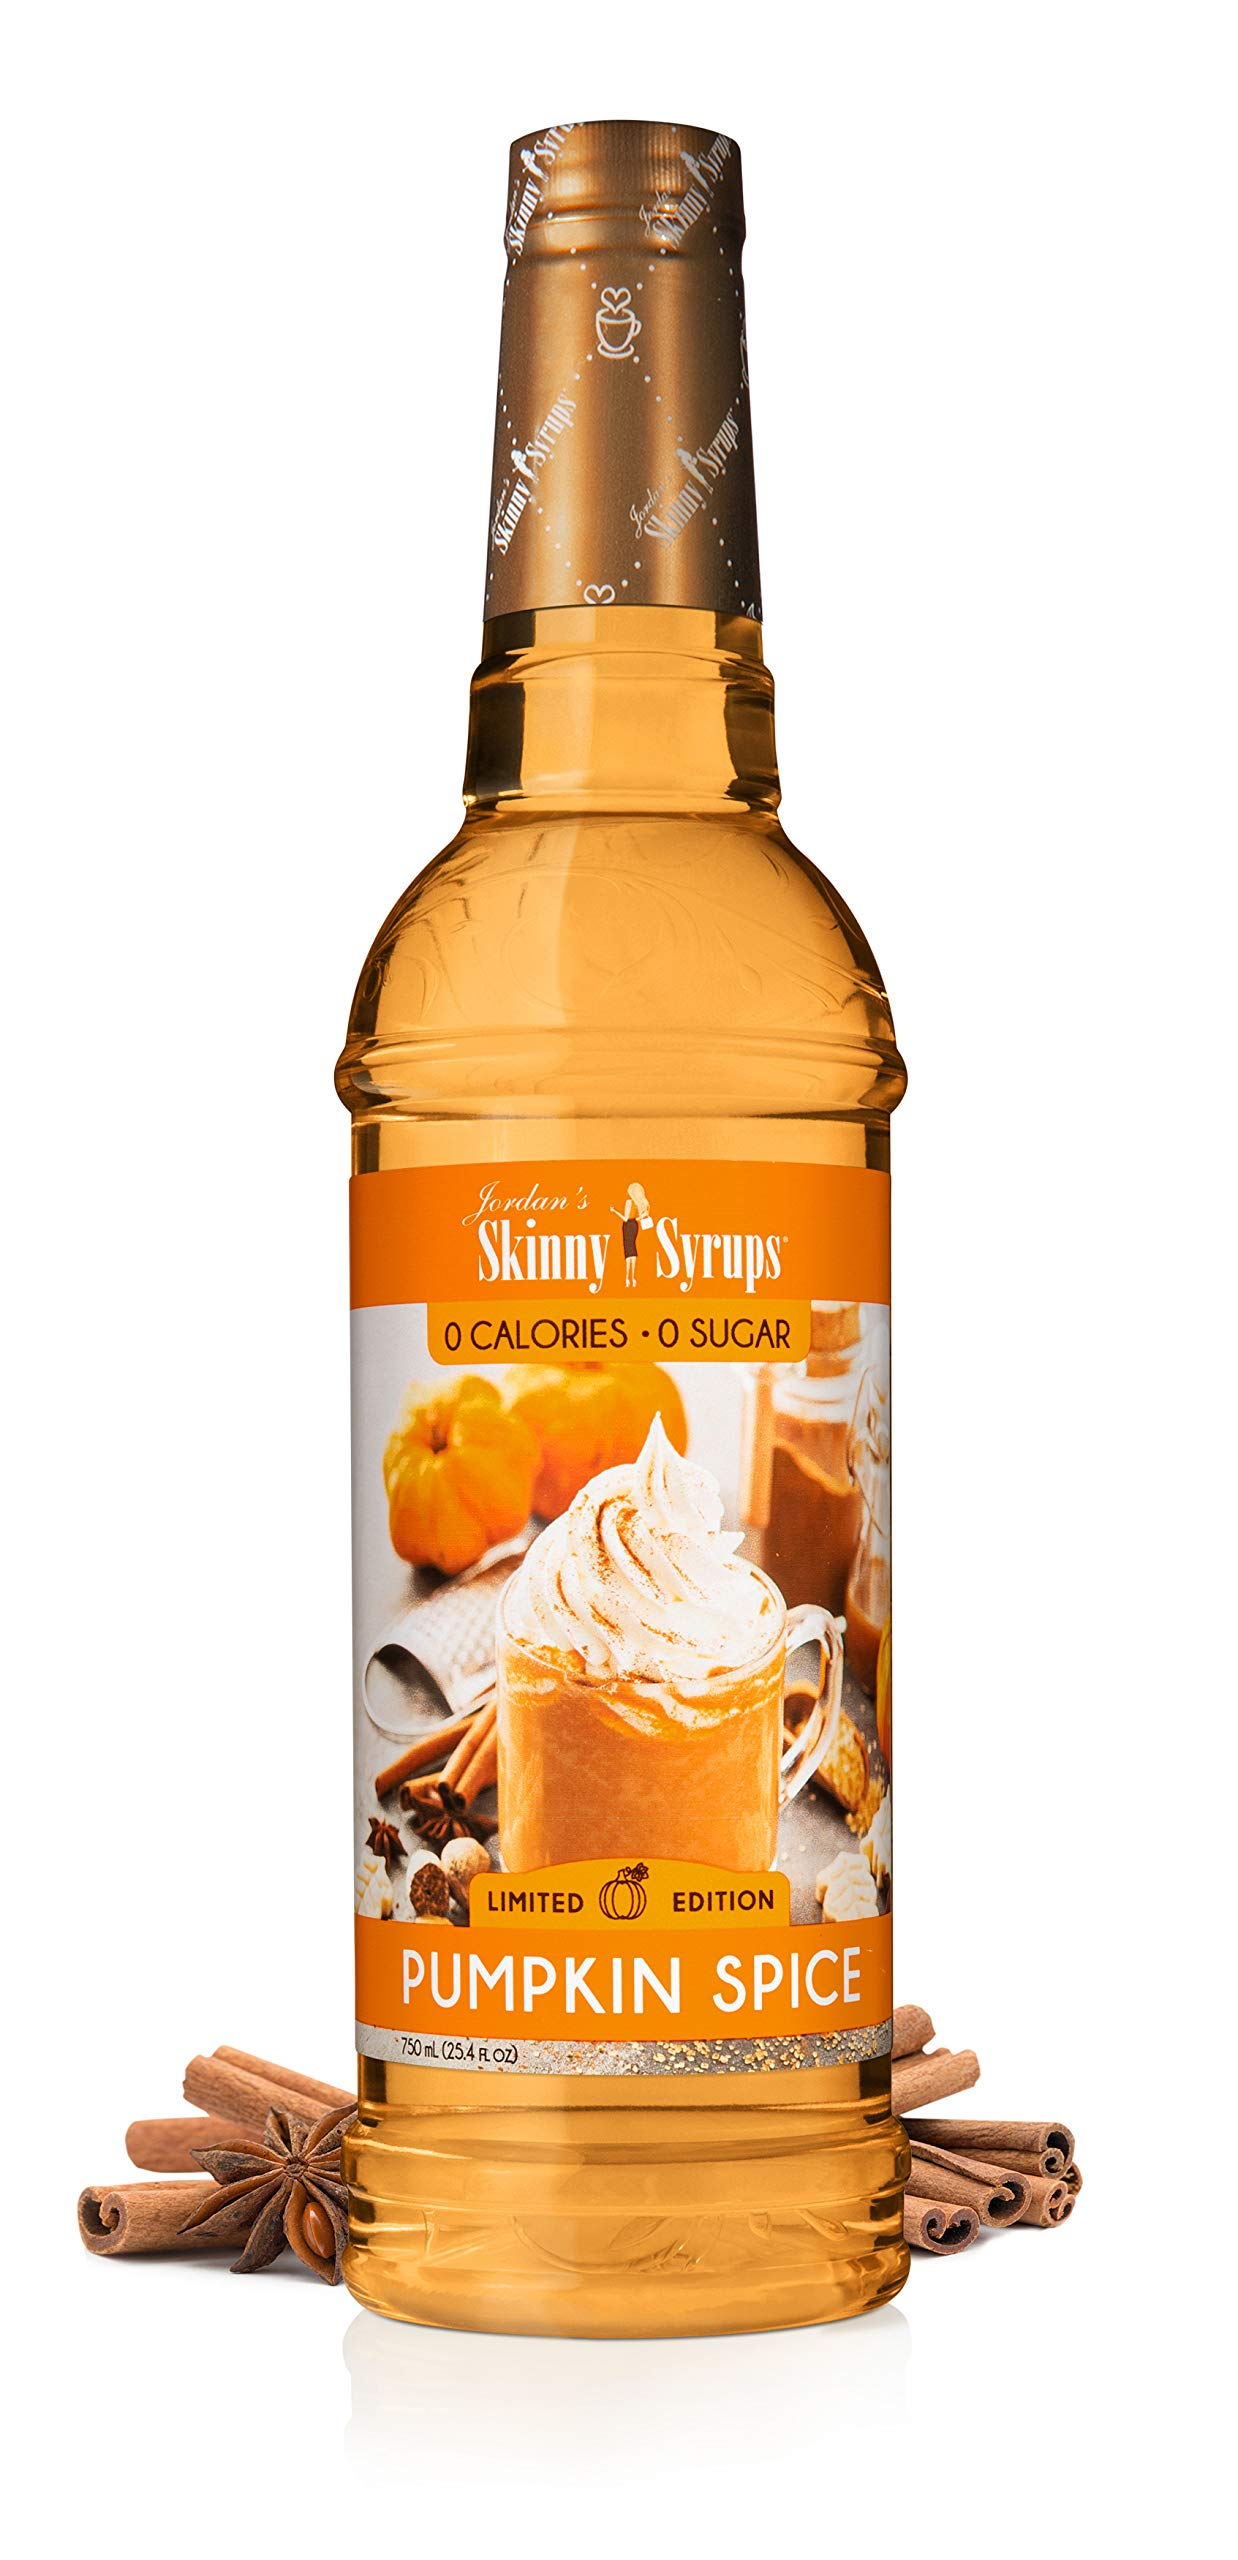 Jordan's Skinny Mixes Sugar Free Coffee Flavoring Syrup, Pumpkin Spice 25.4 Fl Oz